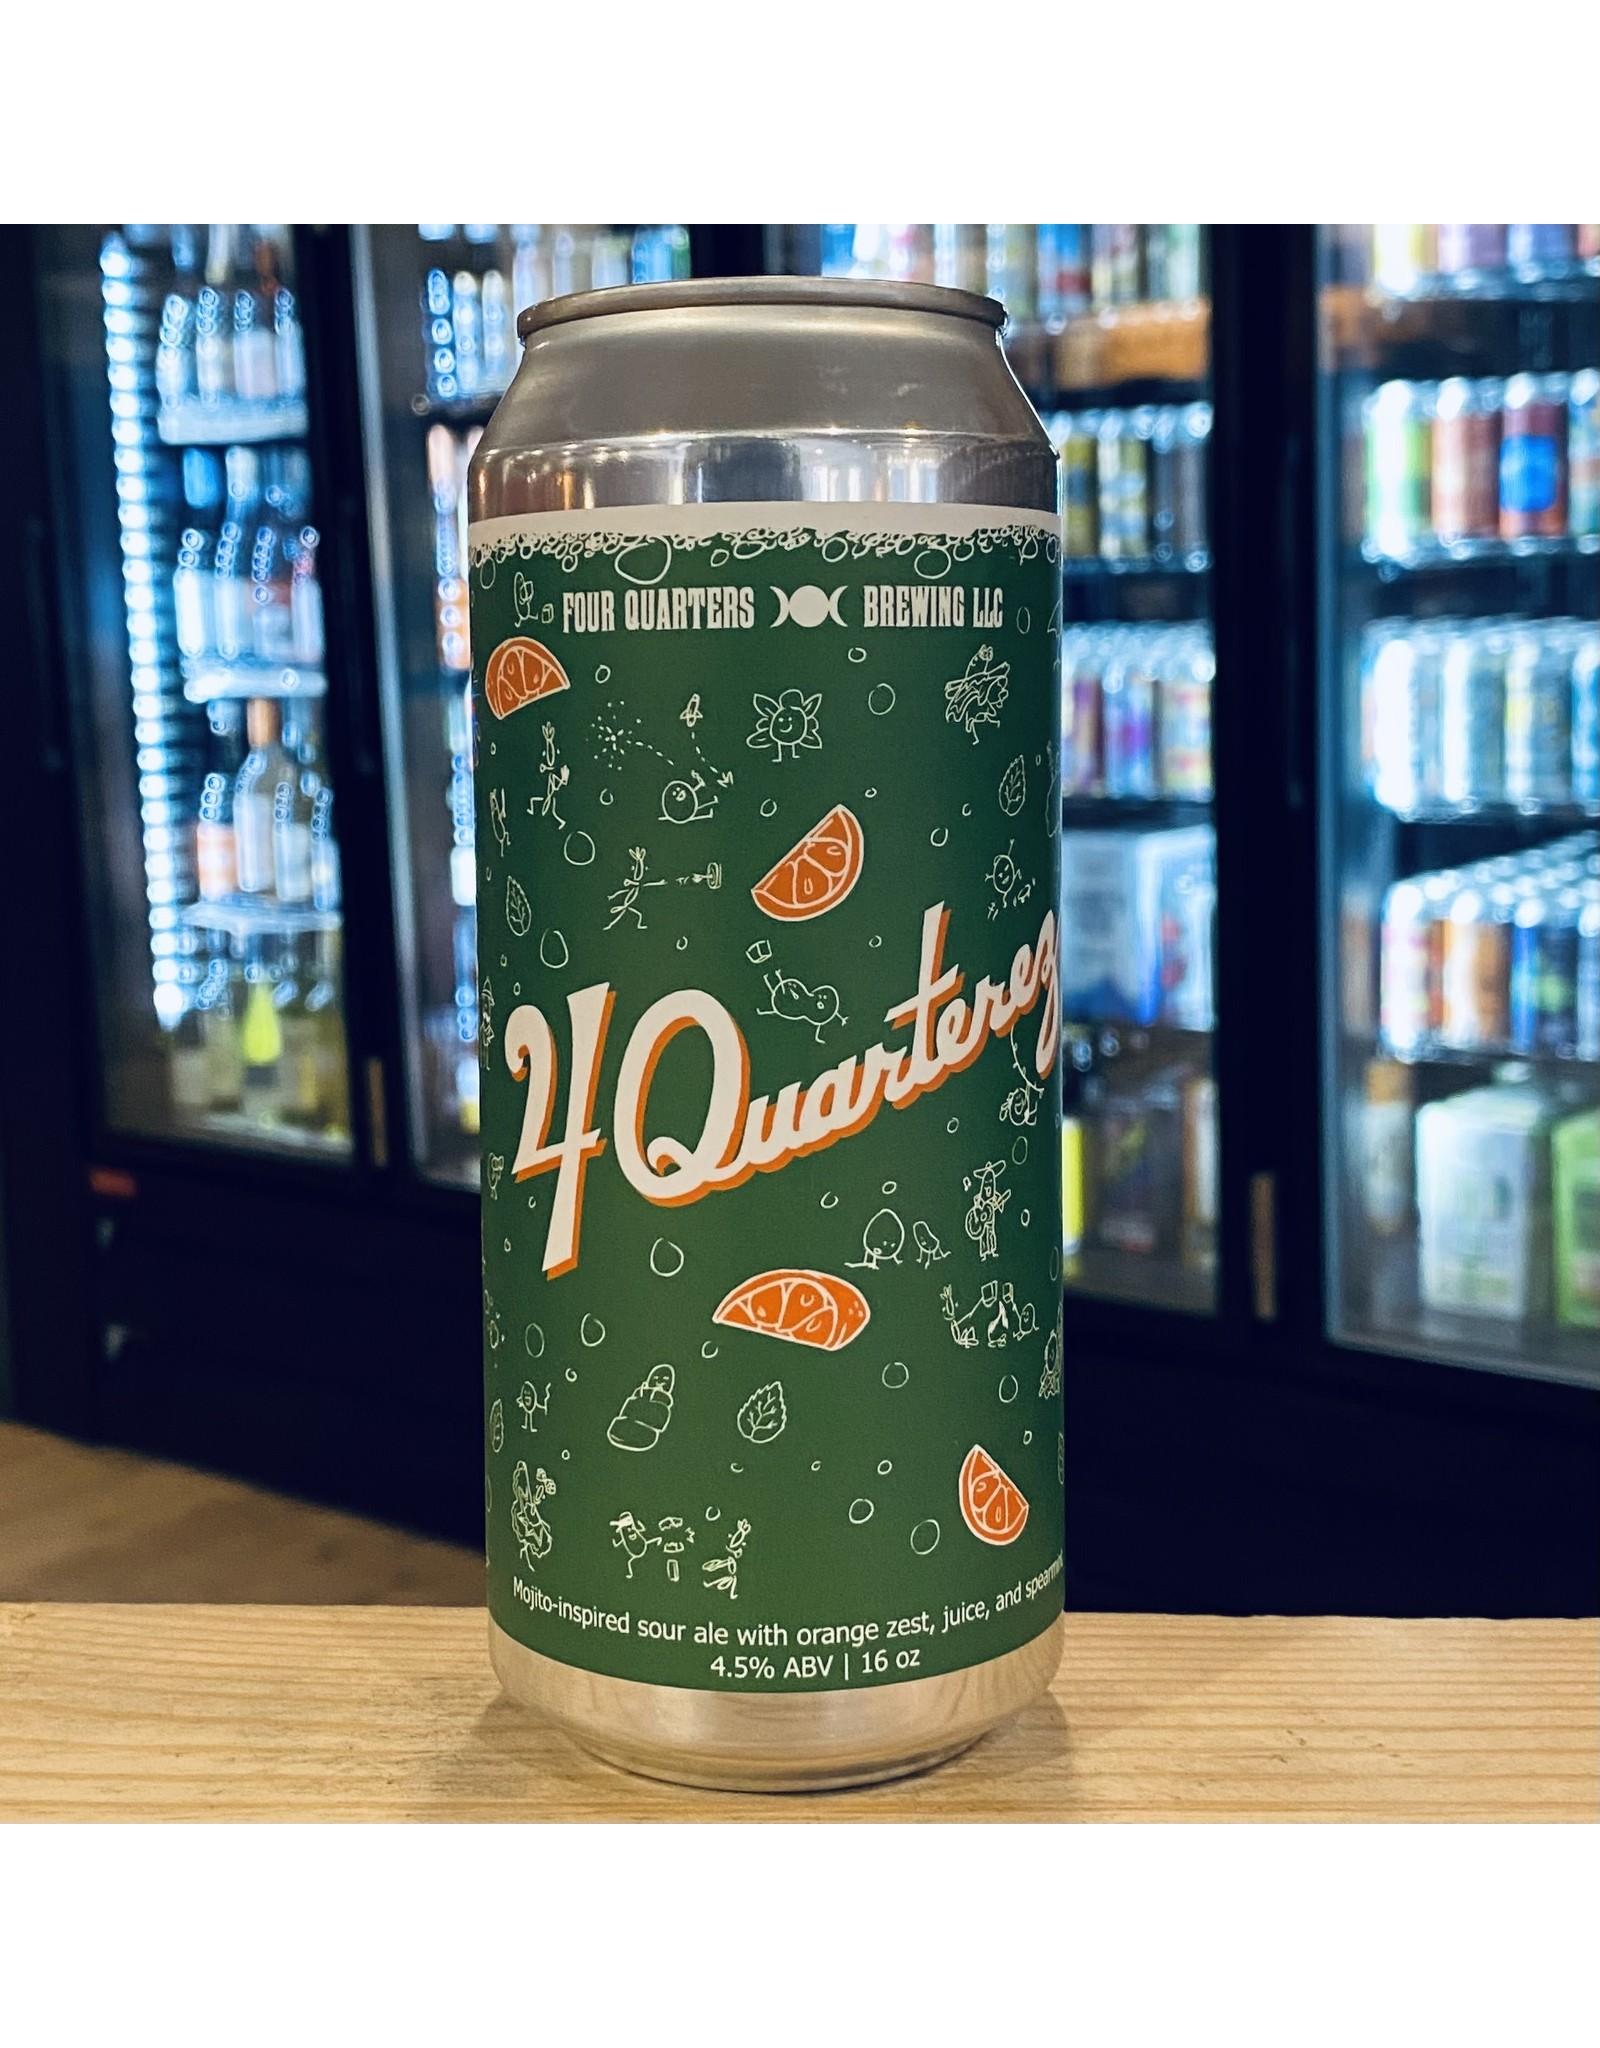 "Sour Four Quarters ""4 Quarterez"" Mojito Inspired Sour Ale w/Orange Zest, Juice and Spearmint - Winooski, Vermont"